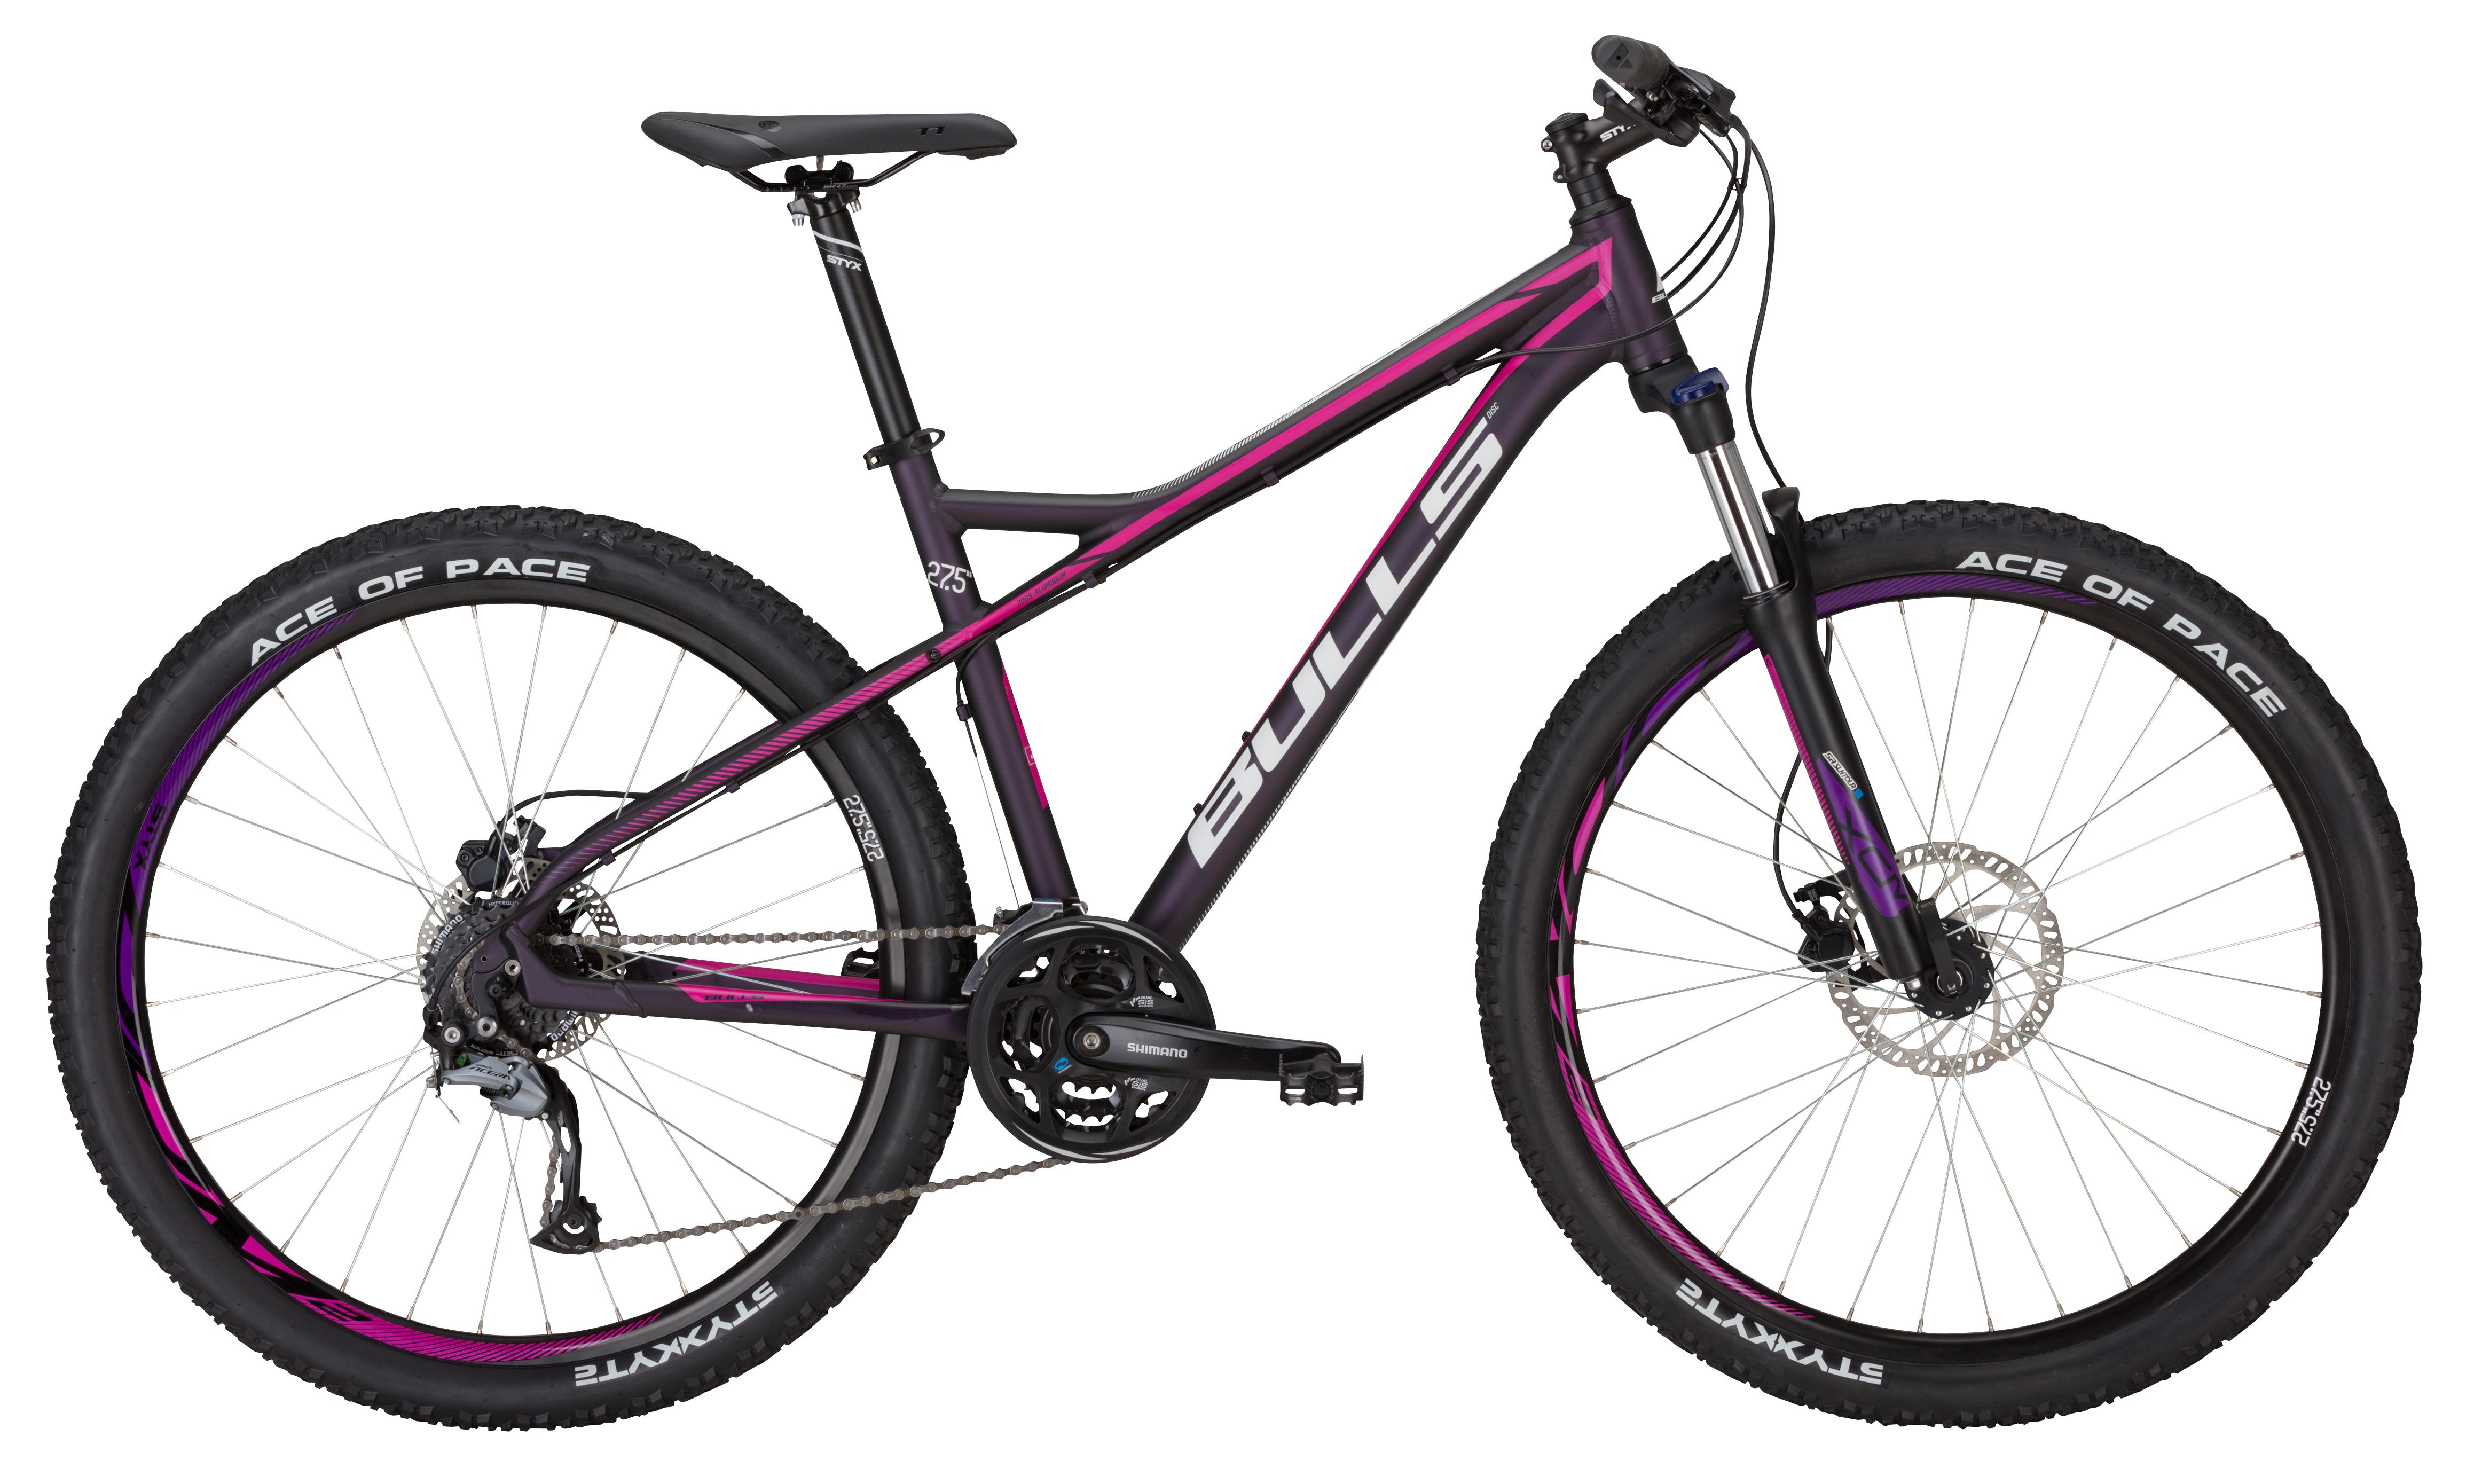 bulls zarena 27 5 zoll shimano 24gang mountainbike 41cm damen fahrrad mtb 2017 ebay. Black Bedroom Furniture Sets. Home Design Ideas